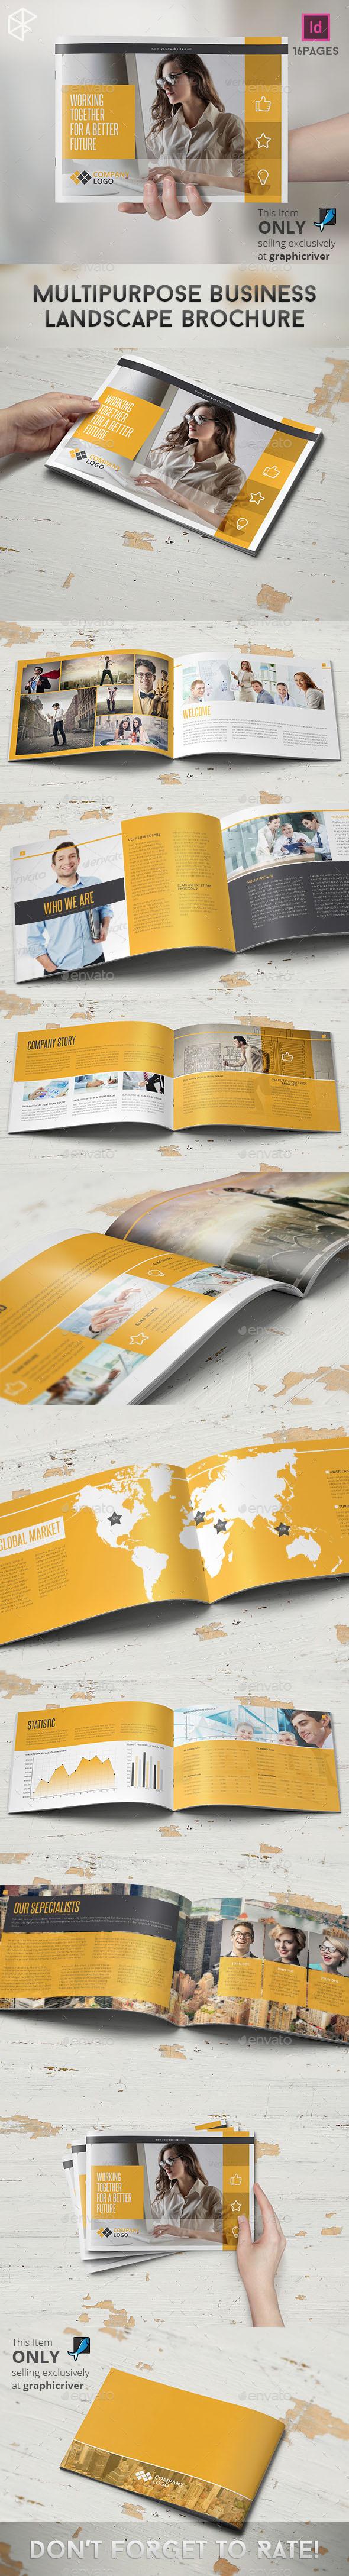 Multipurpose Business Landscape Brochure - Corporate Brochures